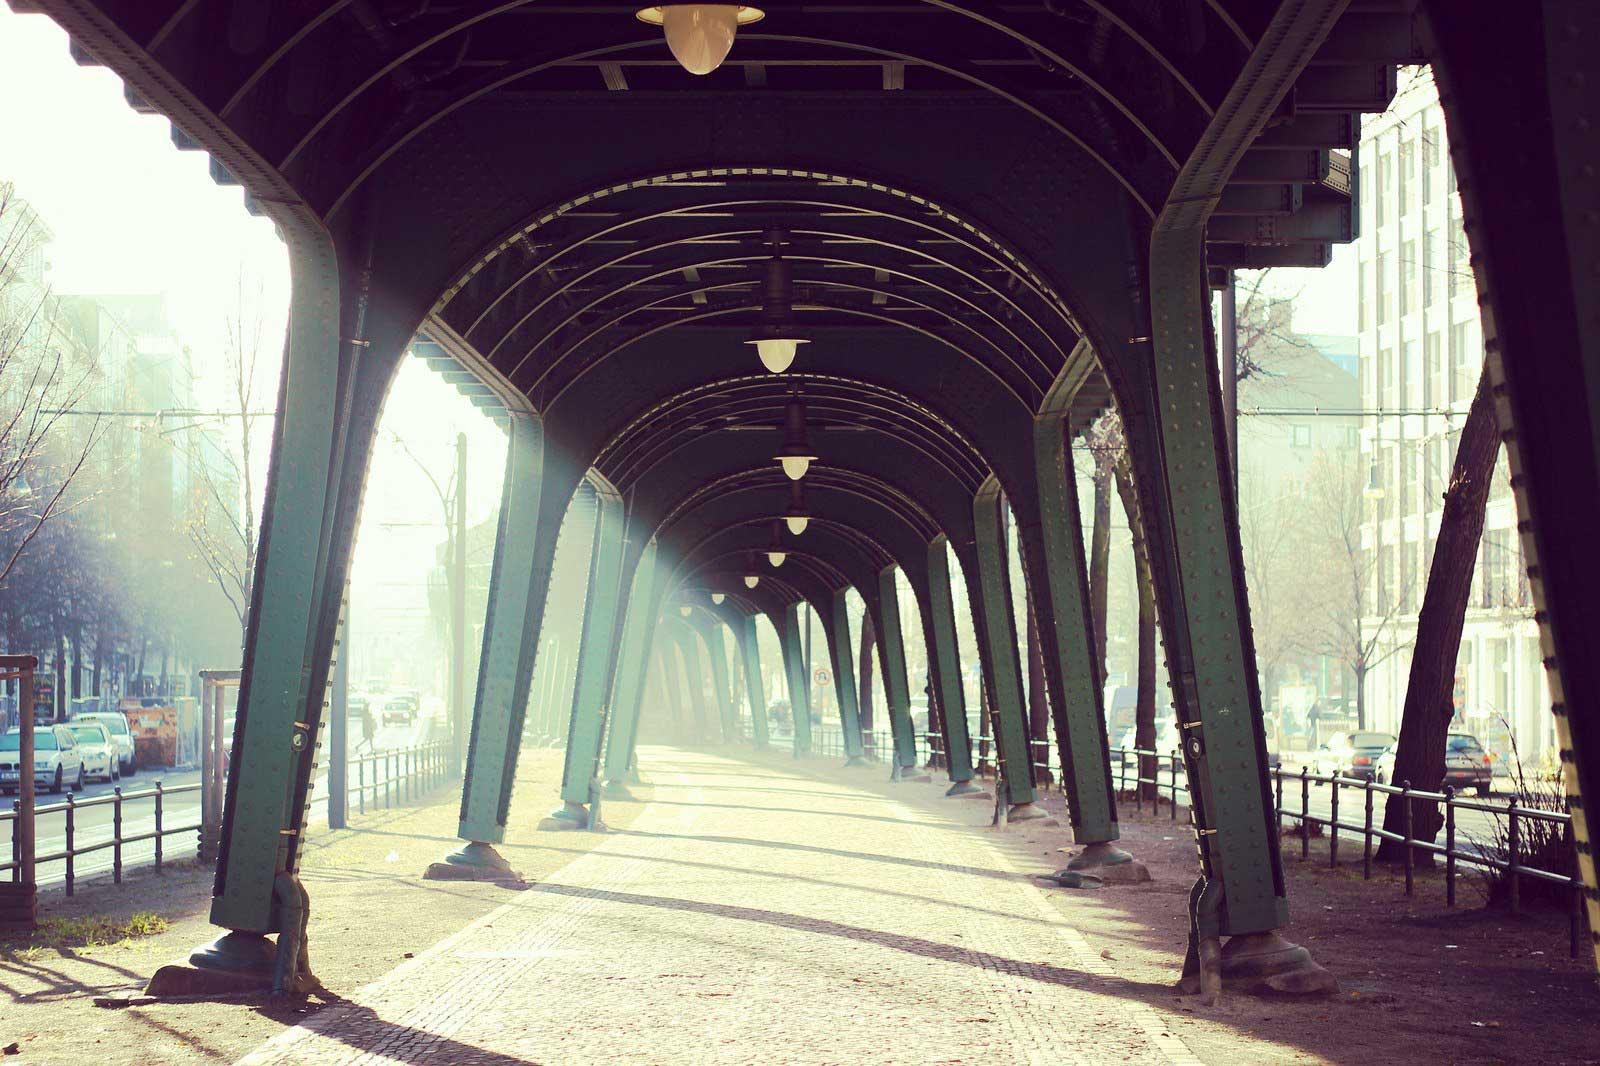 Archway Path